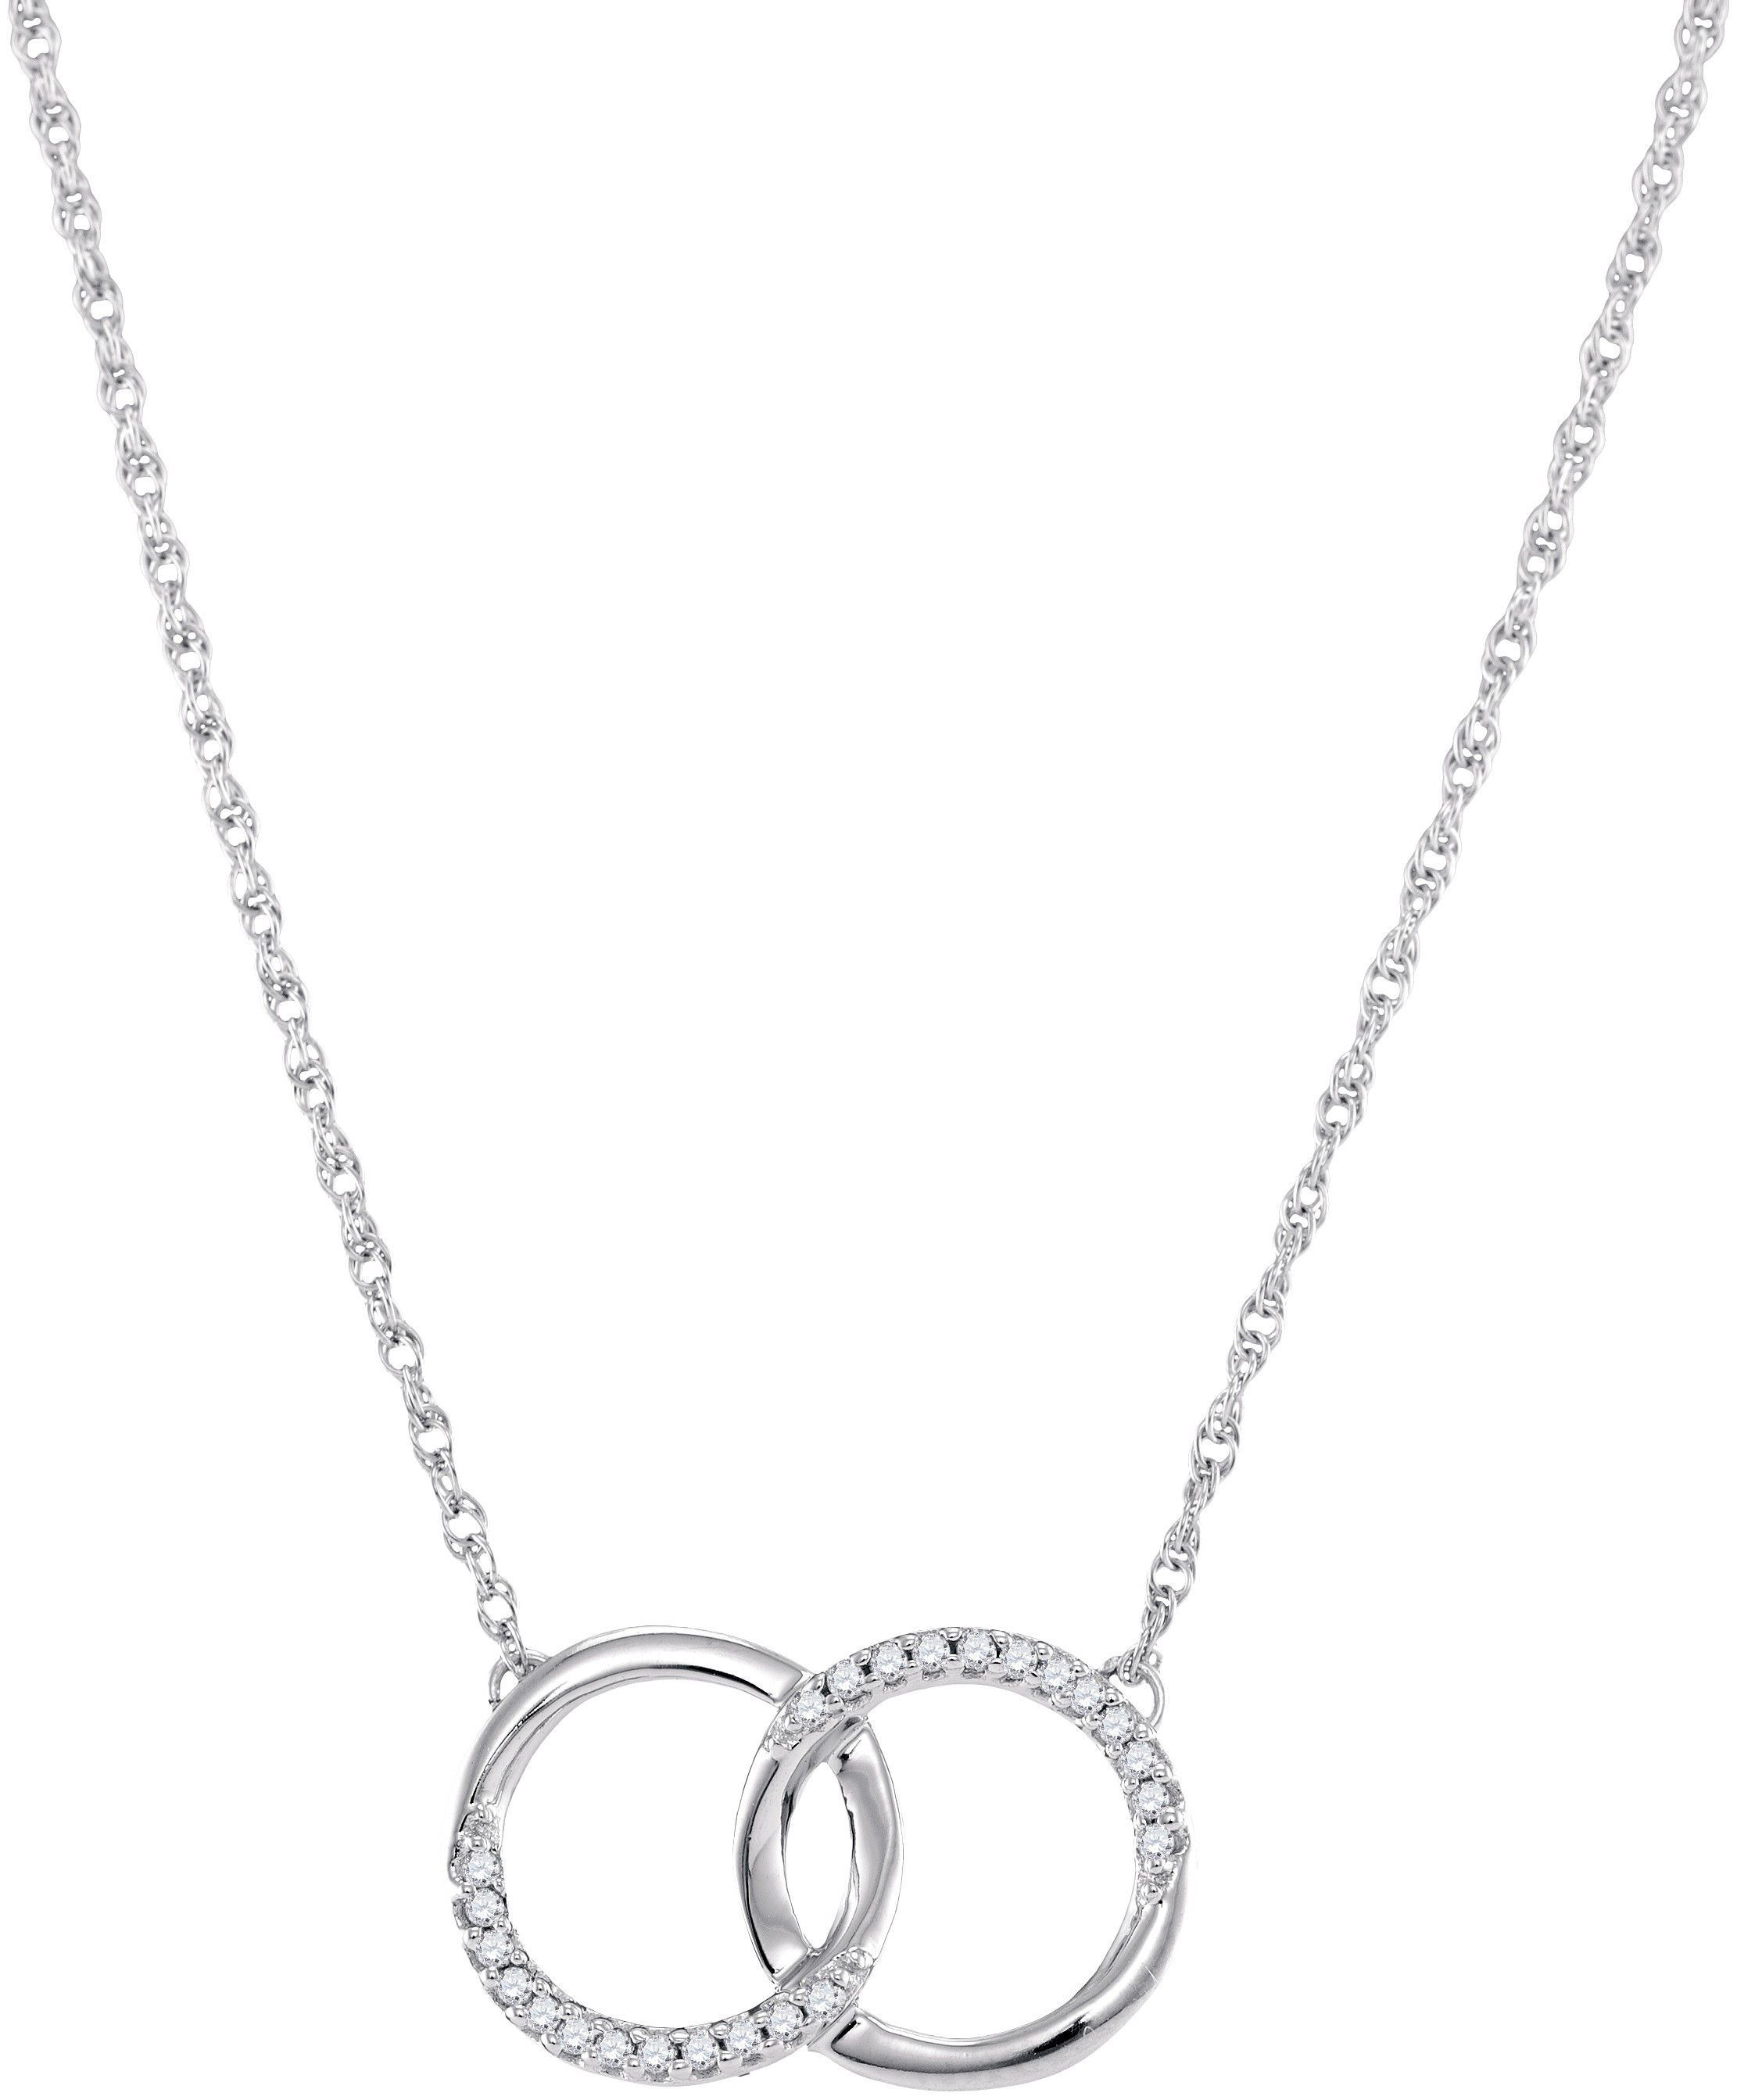 10kt white gold womens round diamond circle pendant necklace 110 10kt white gold womens round diamond circle pendant necklace 110 cttw 97492 aloadofball Choice Image